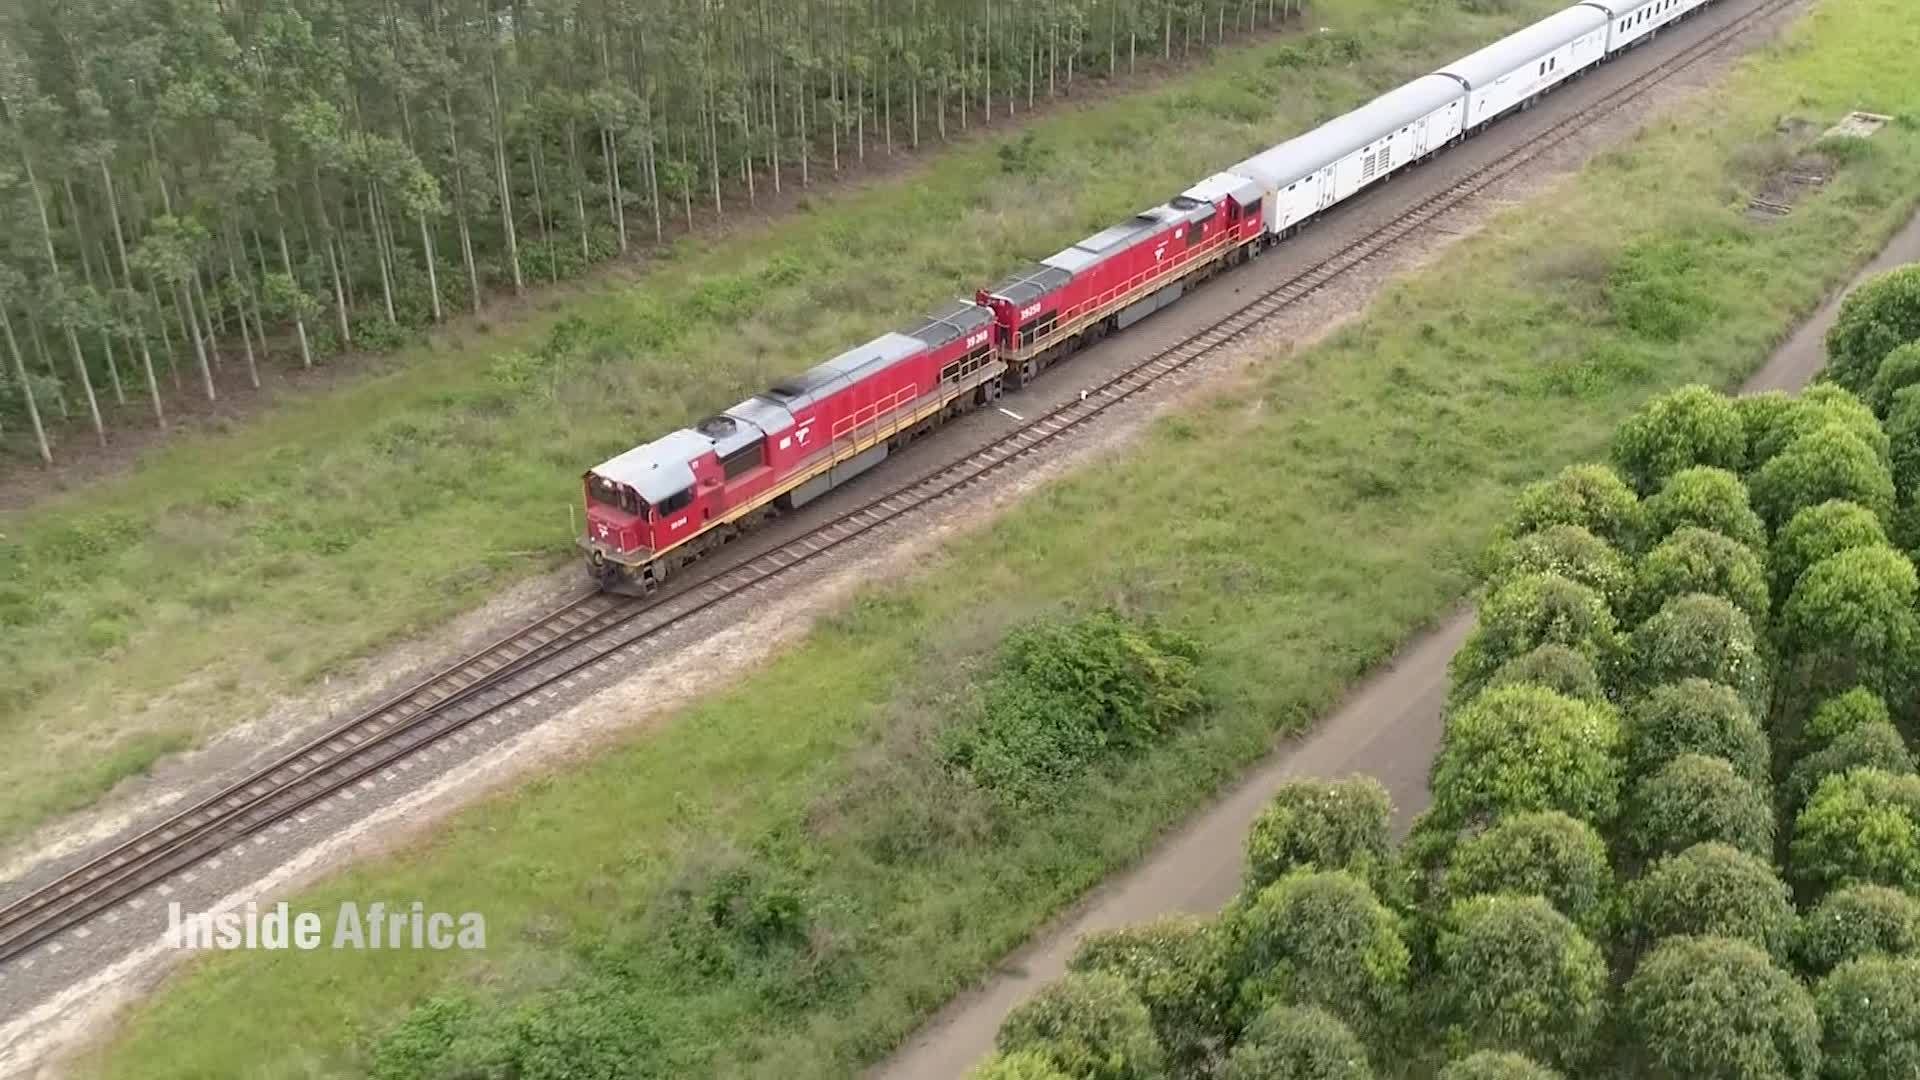 The journey of the Phelophepa train - CNN Video